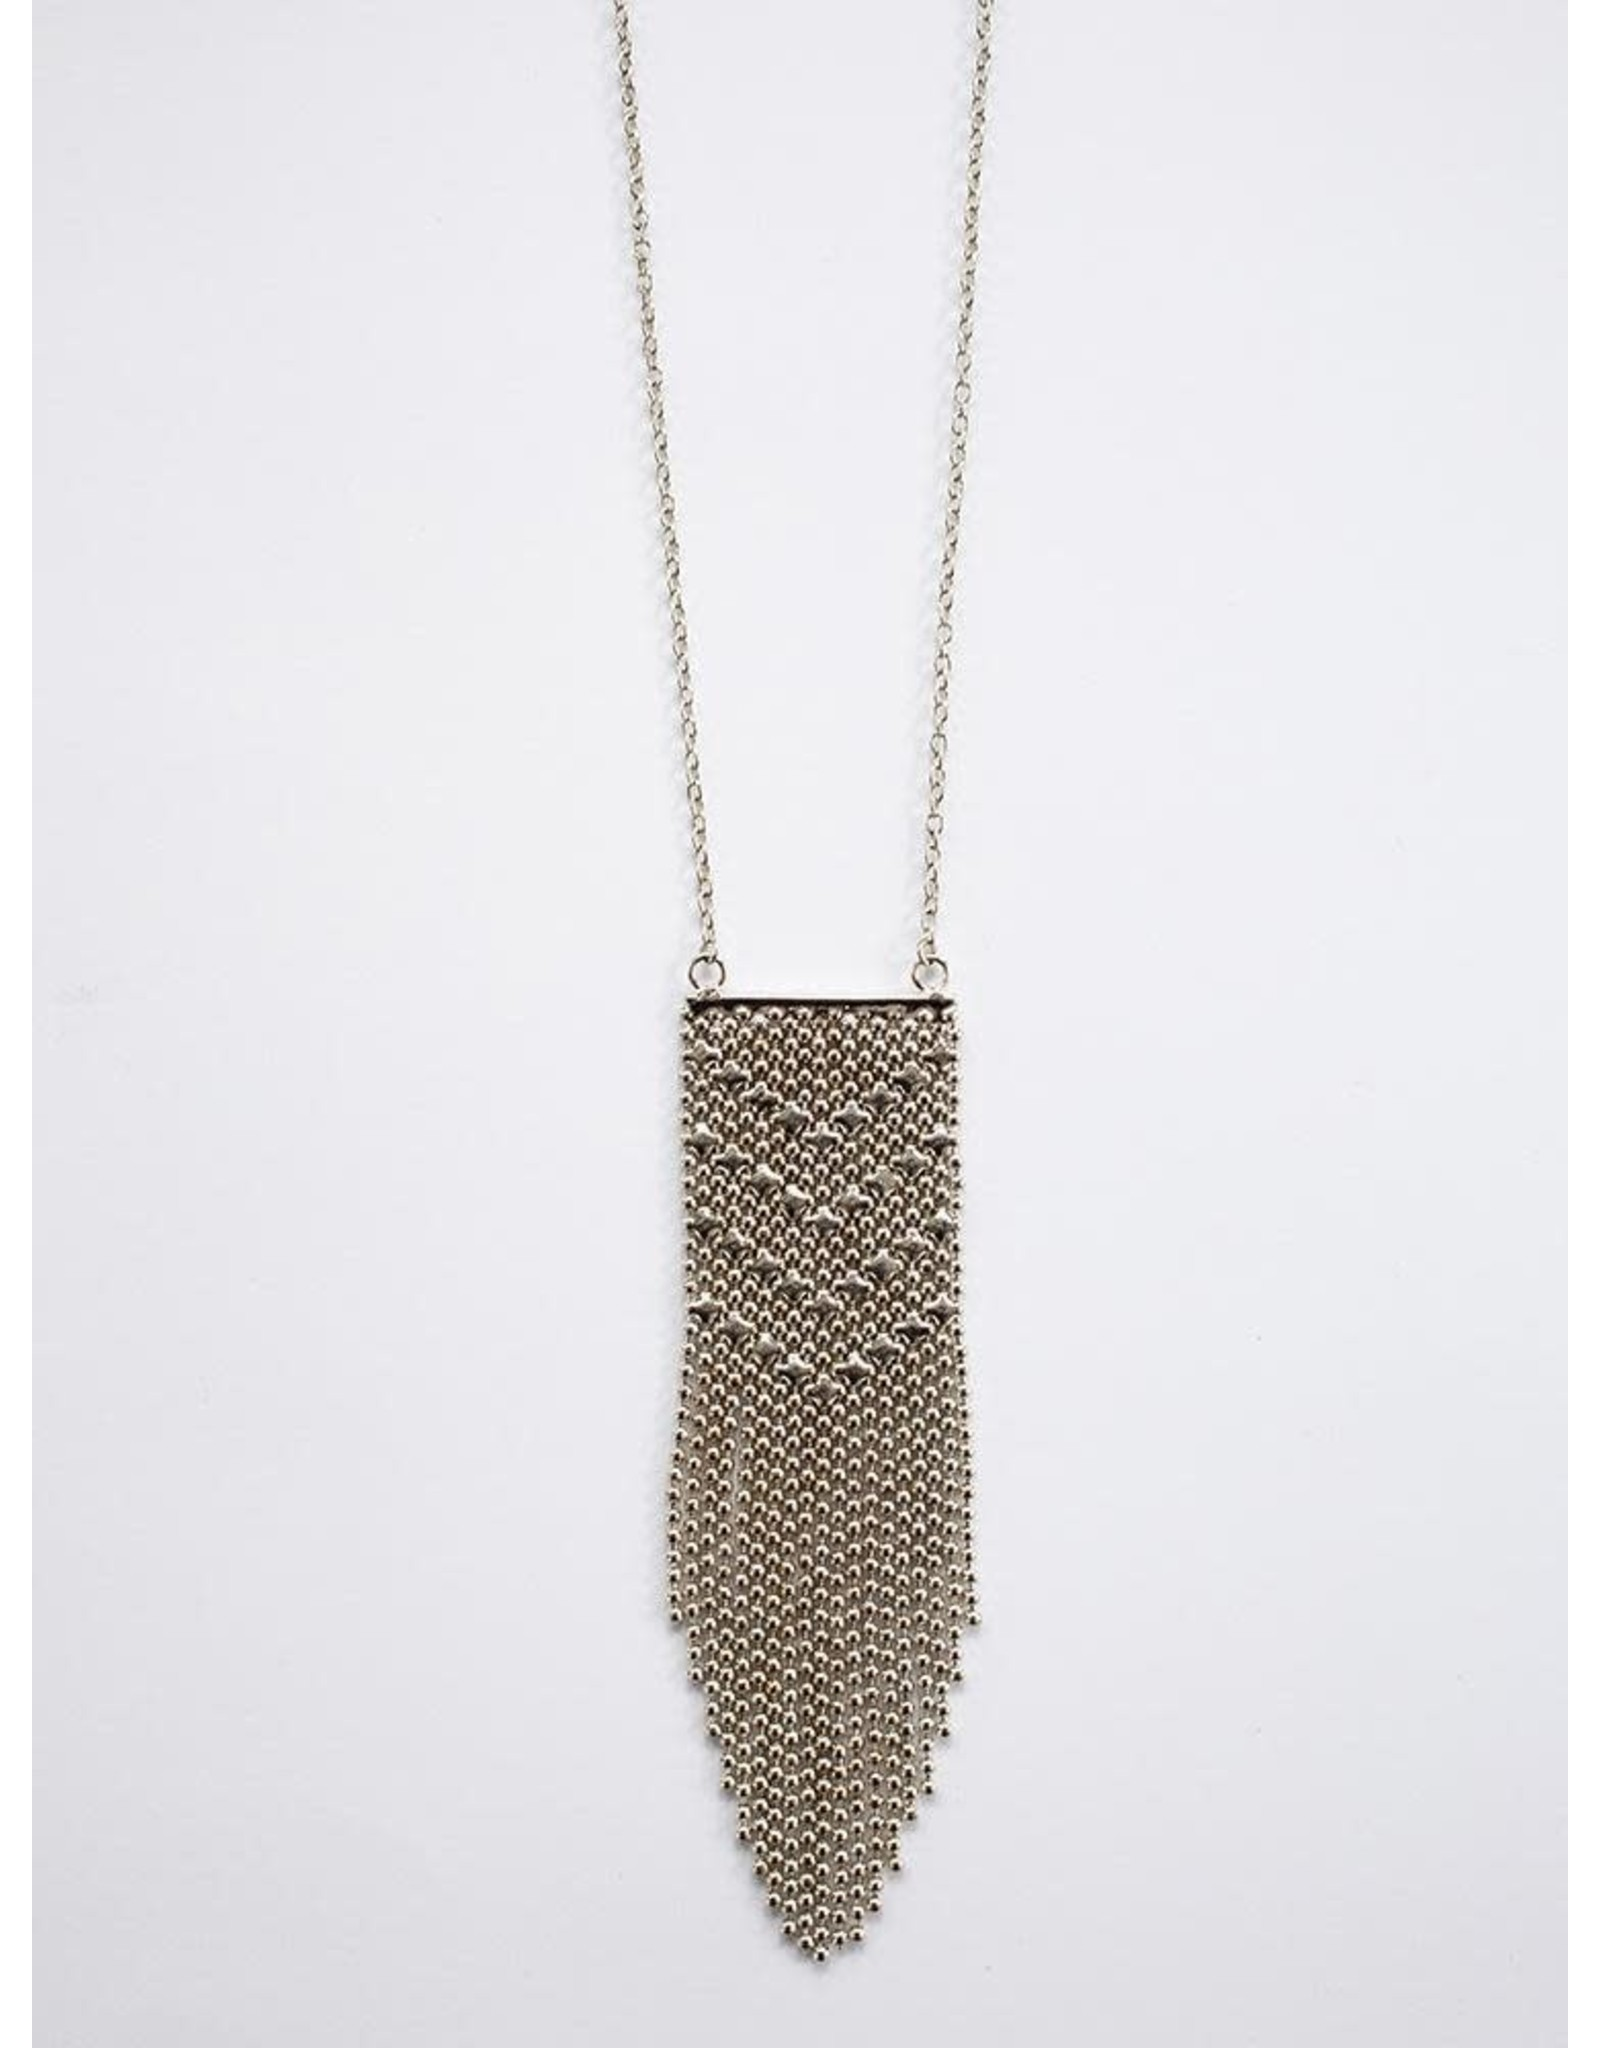 Metalwork Necklace Silver, India